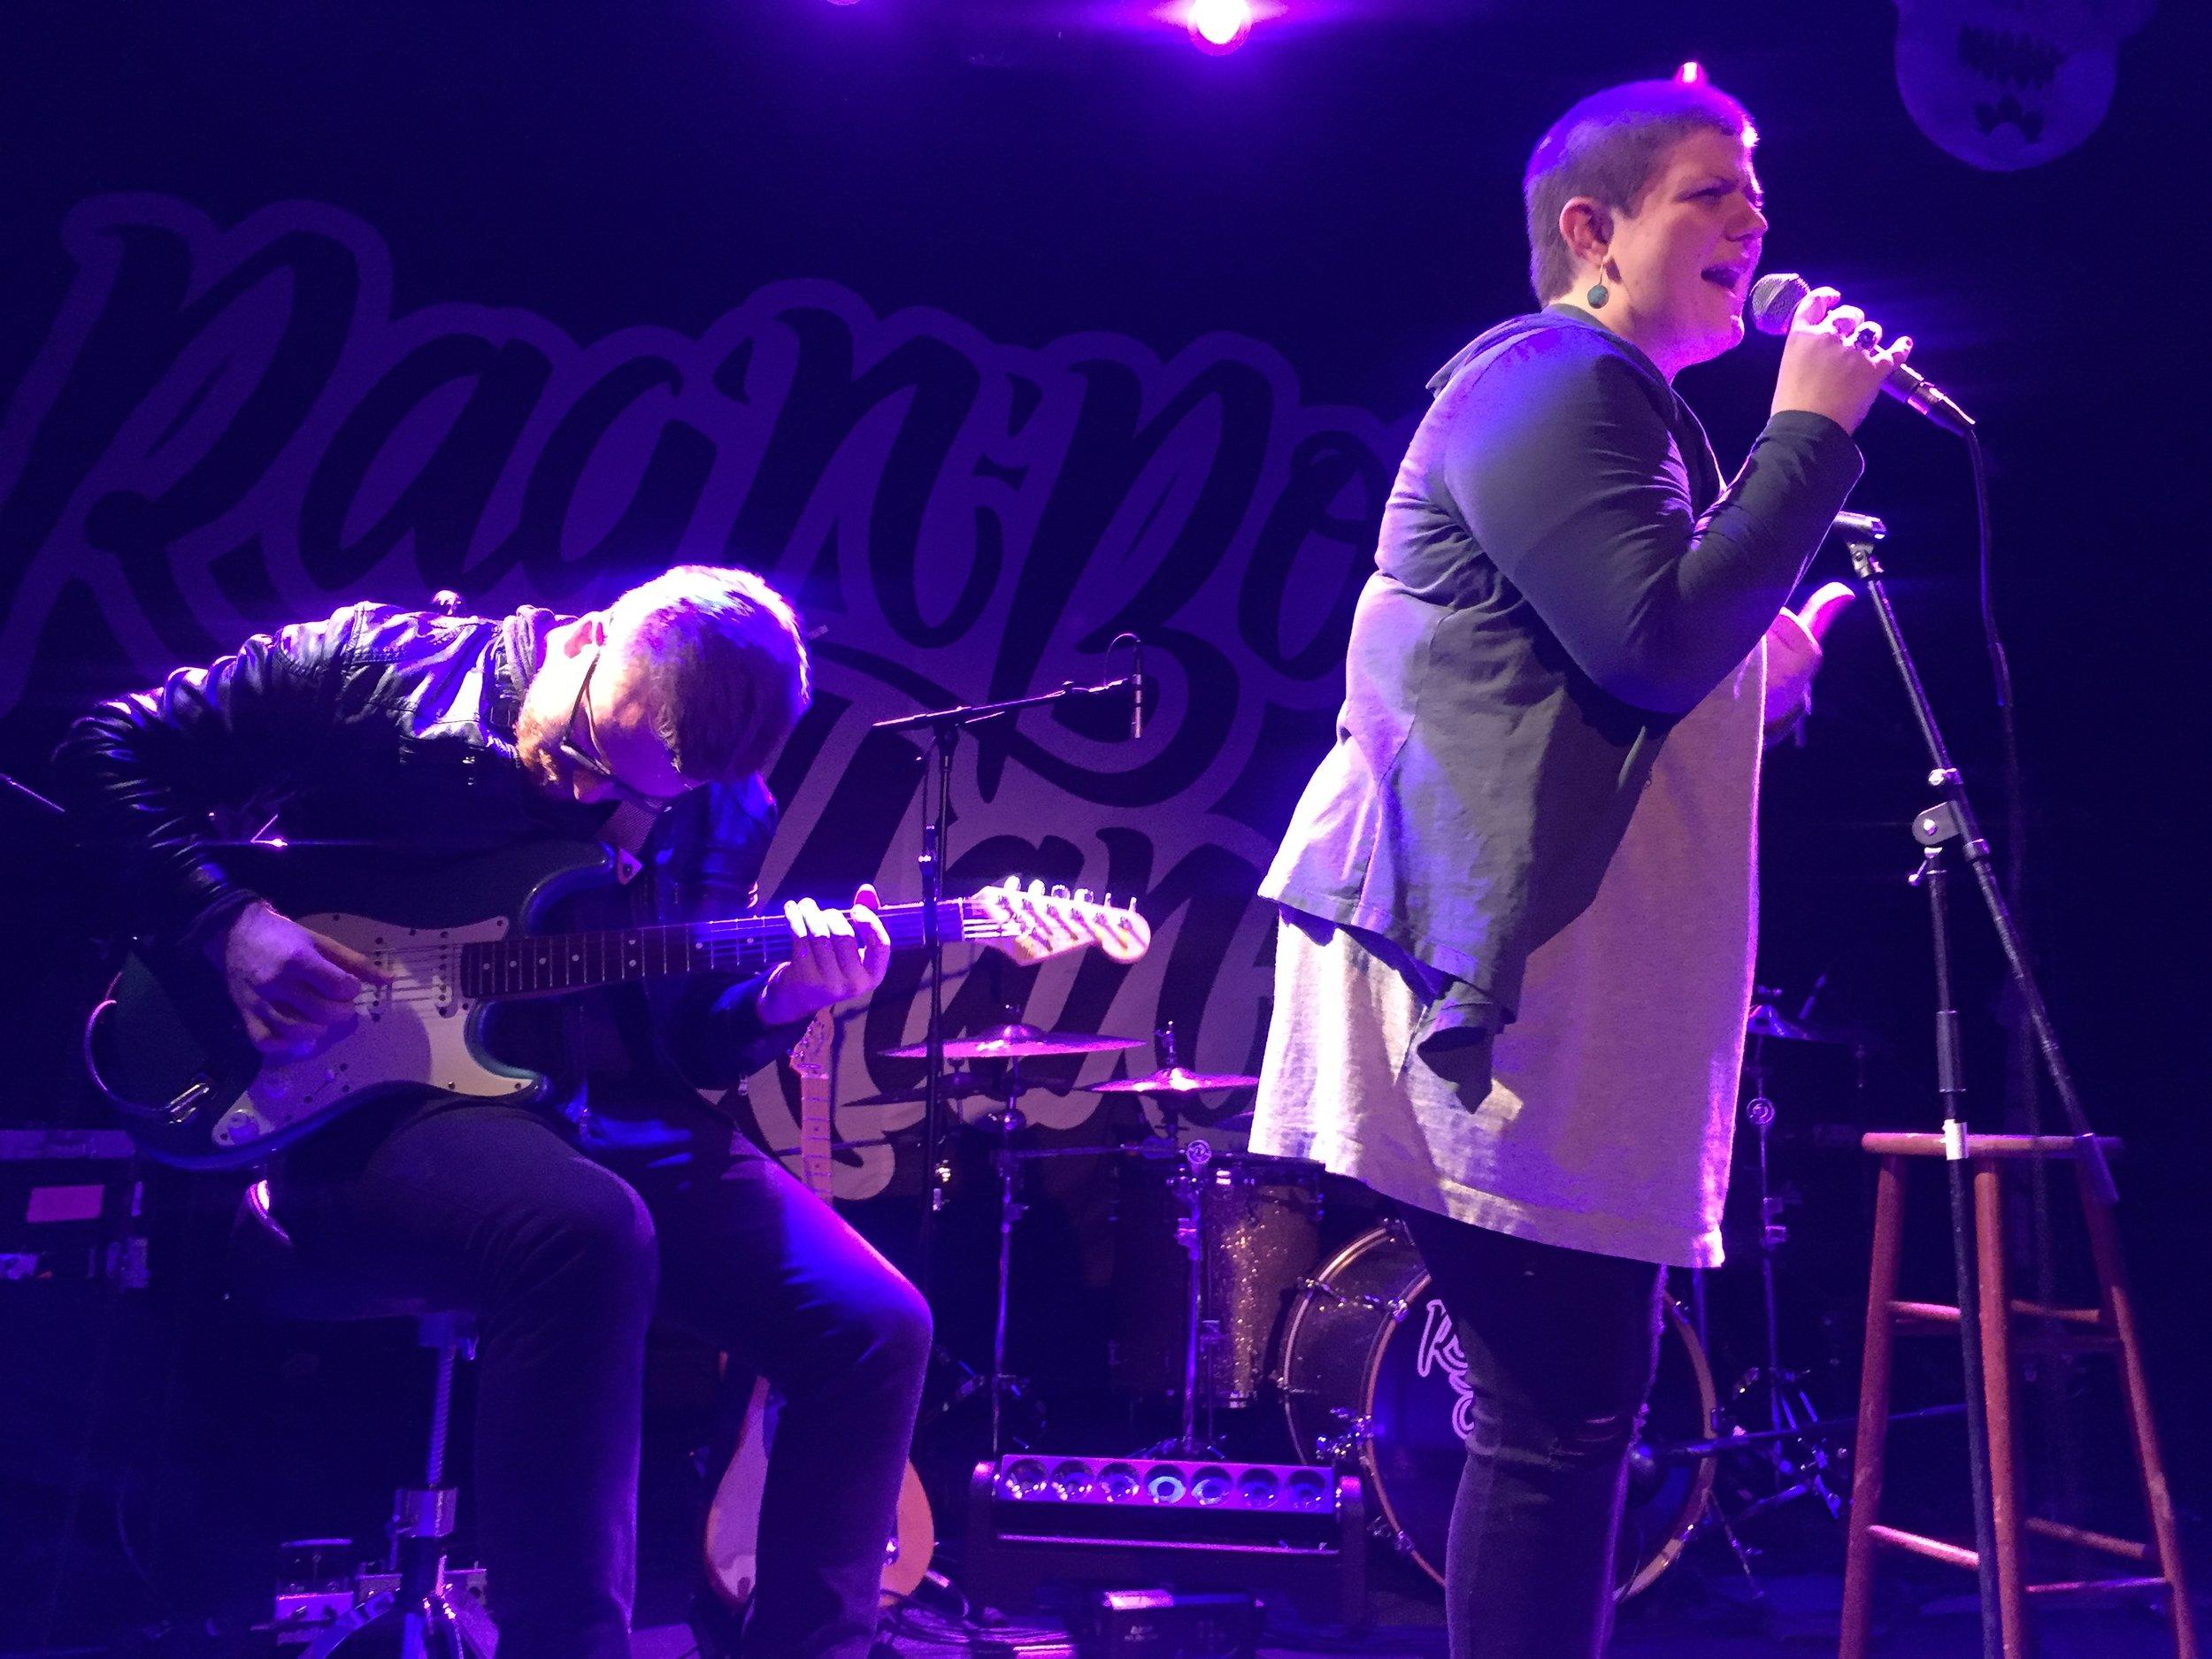 YEBBA at The Bowery Ballroom 3/9/17